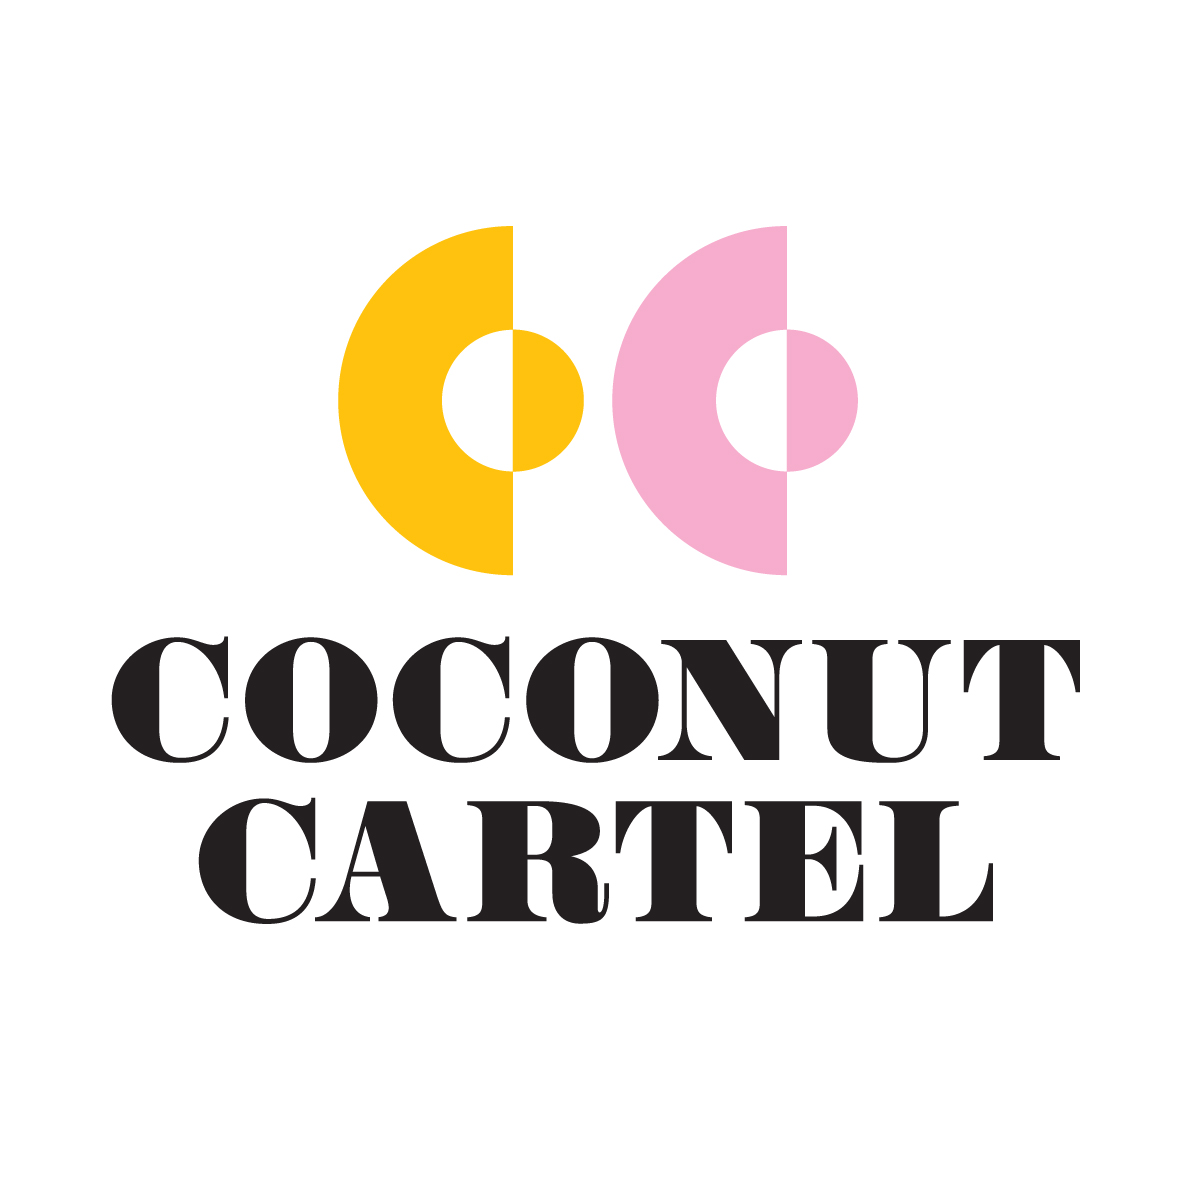 Coconut cartel logo wht